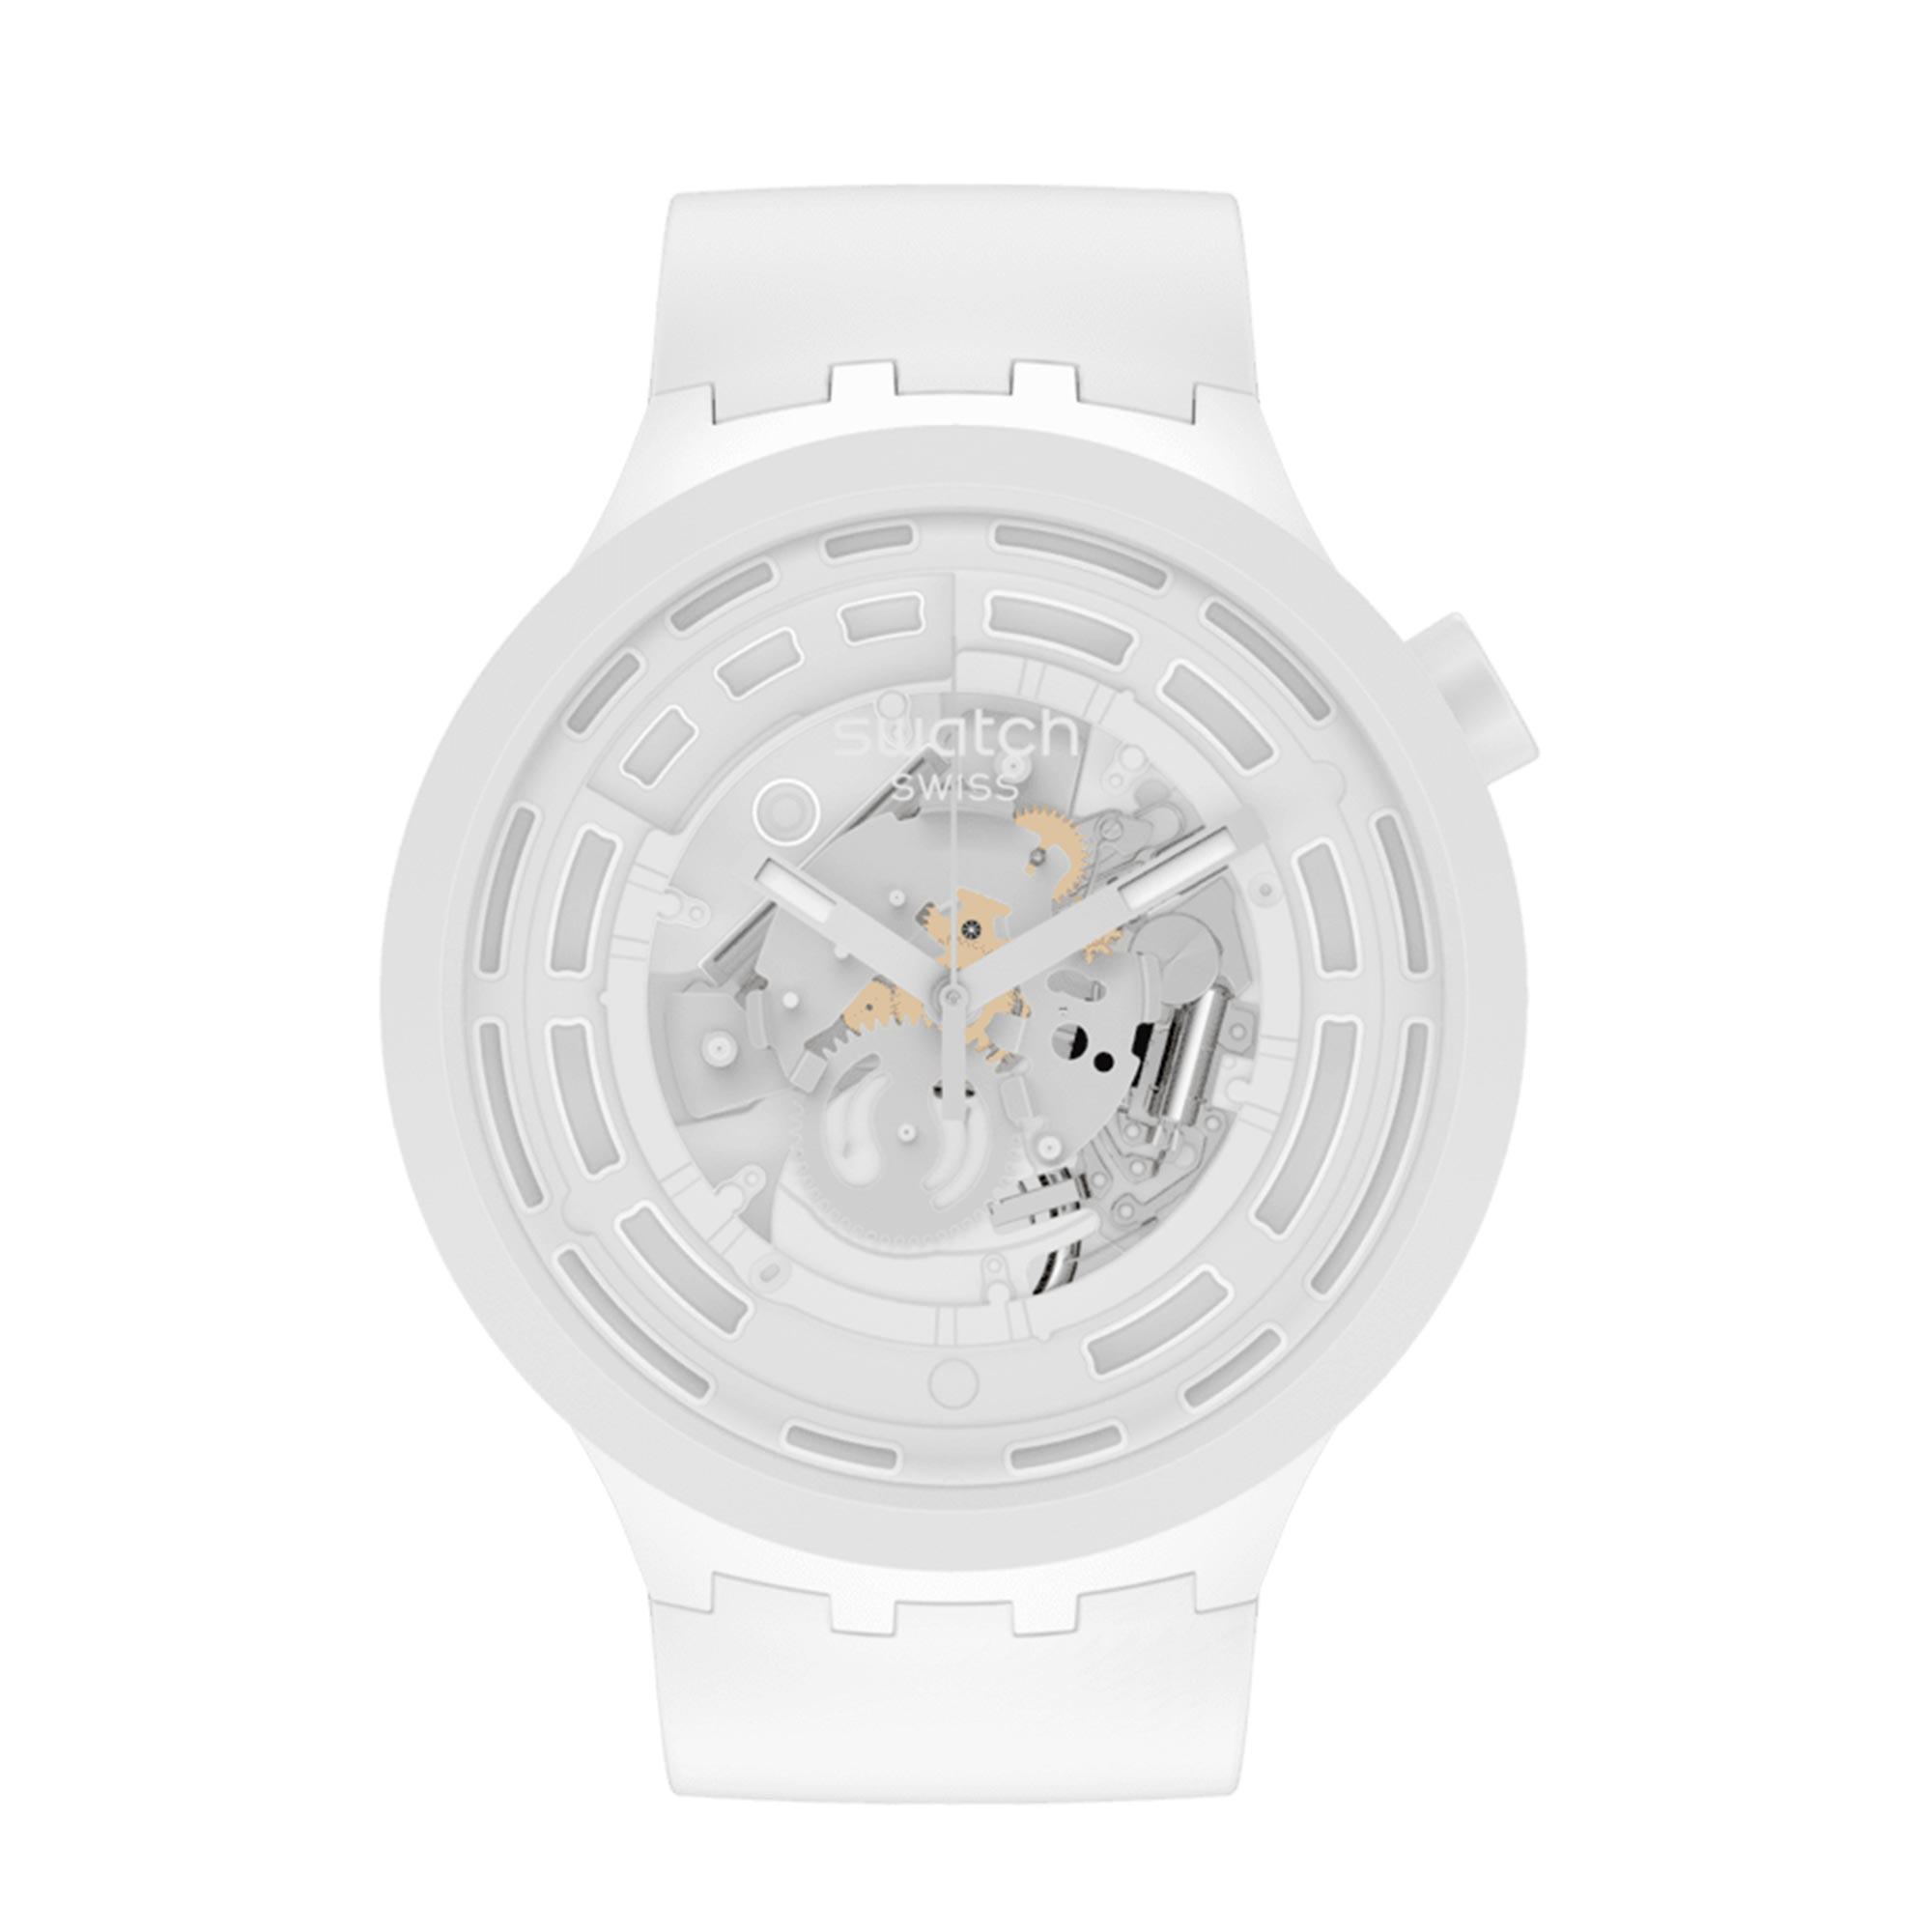 Swatch Big Bold Next Quartz White Dial White Bio-sourced Strap Watch SB03W100